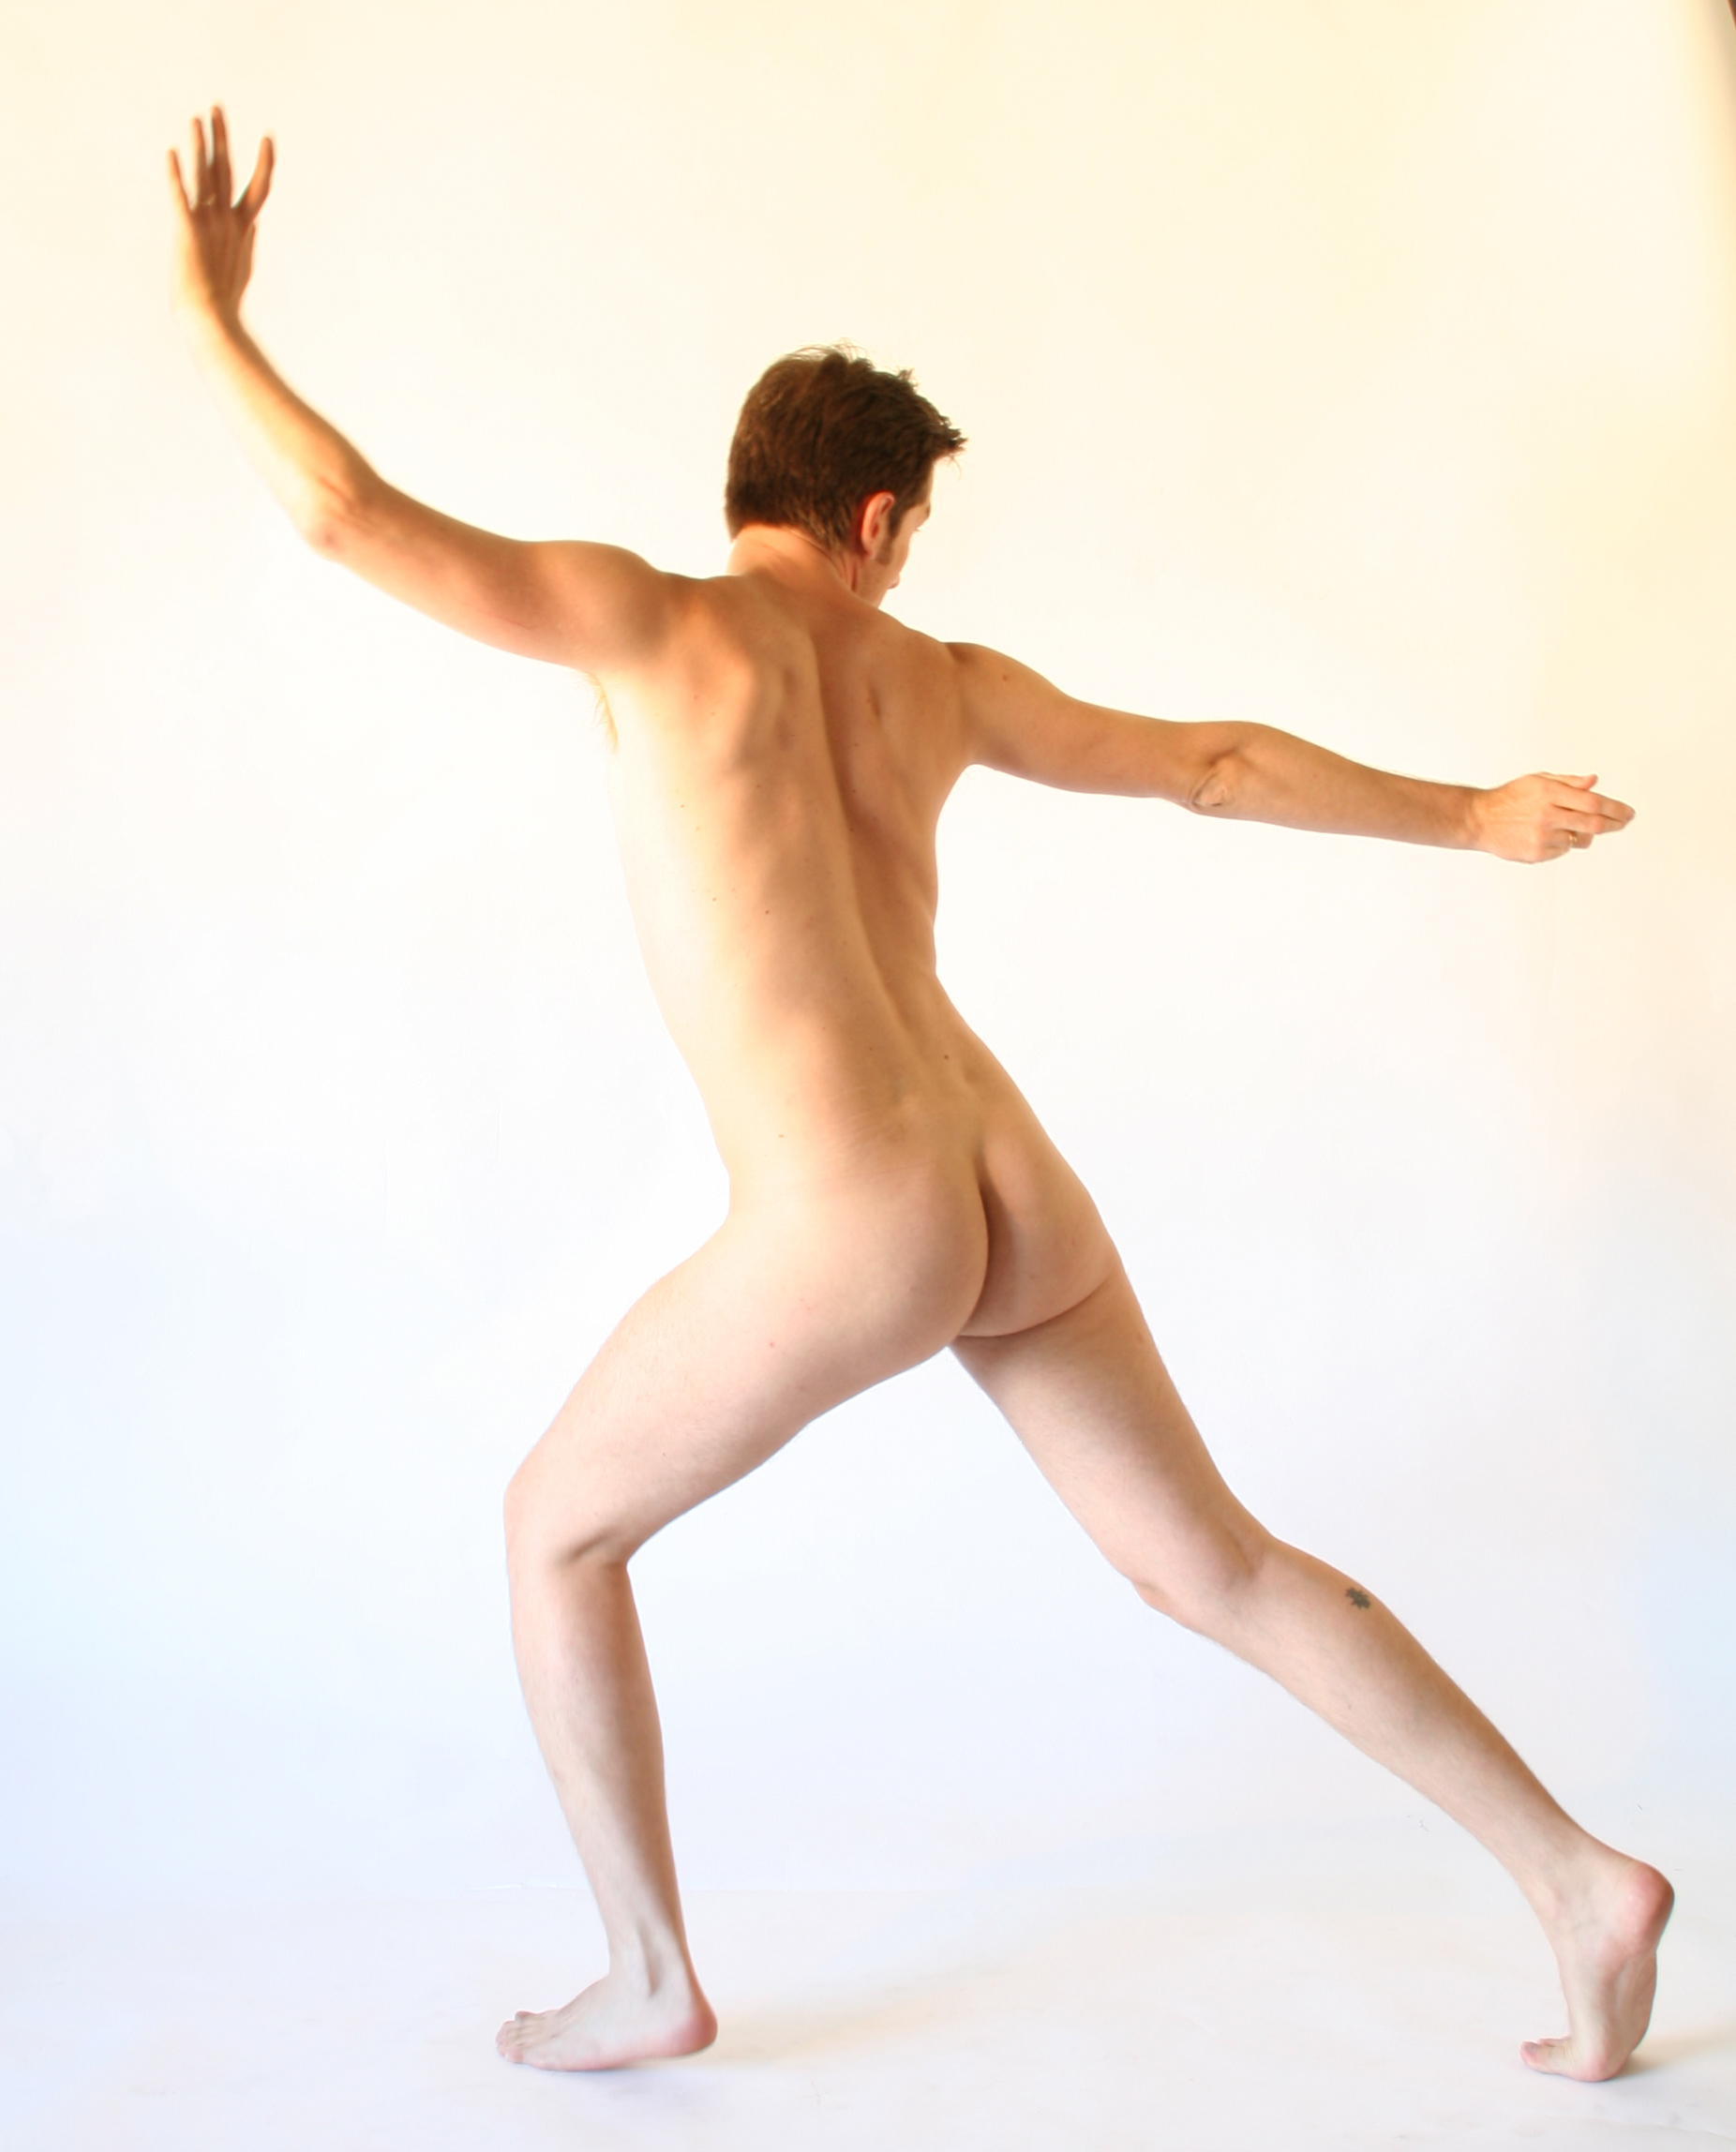 male gesture nude 3